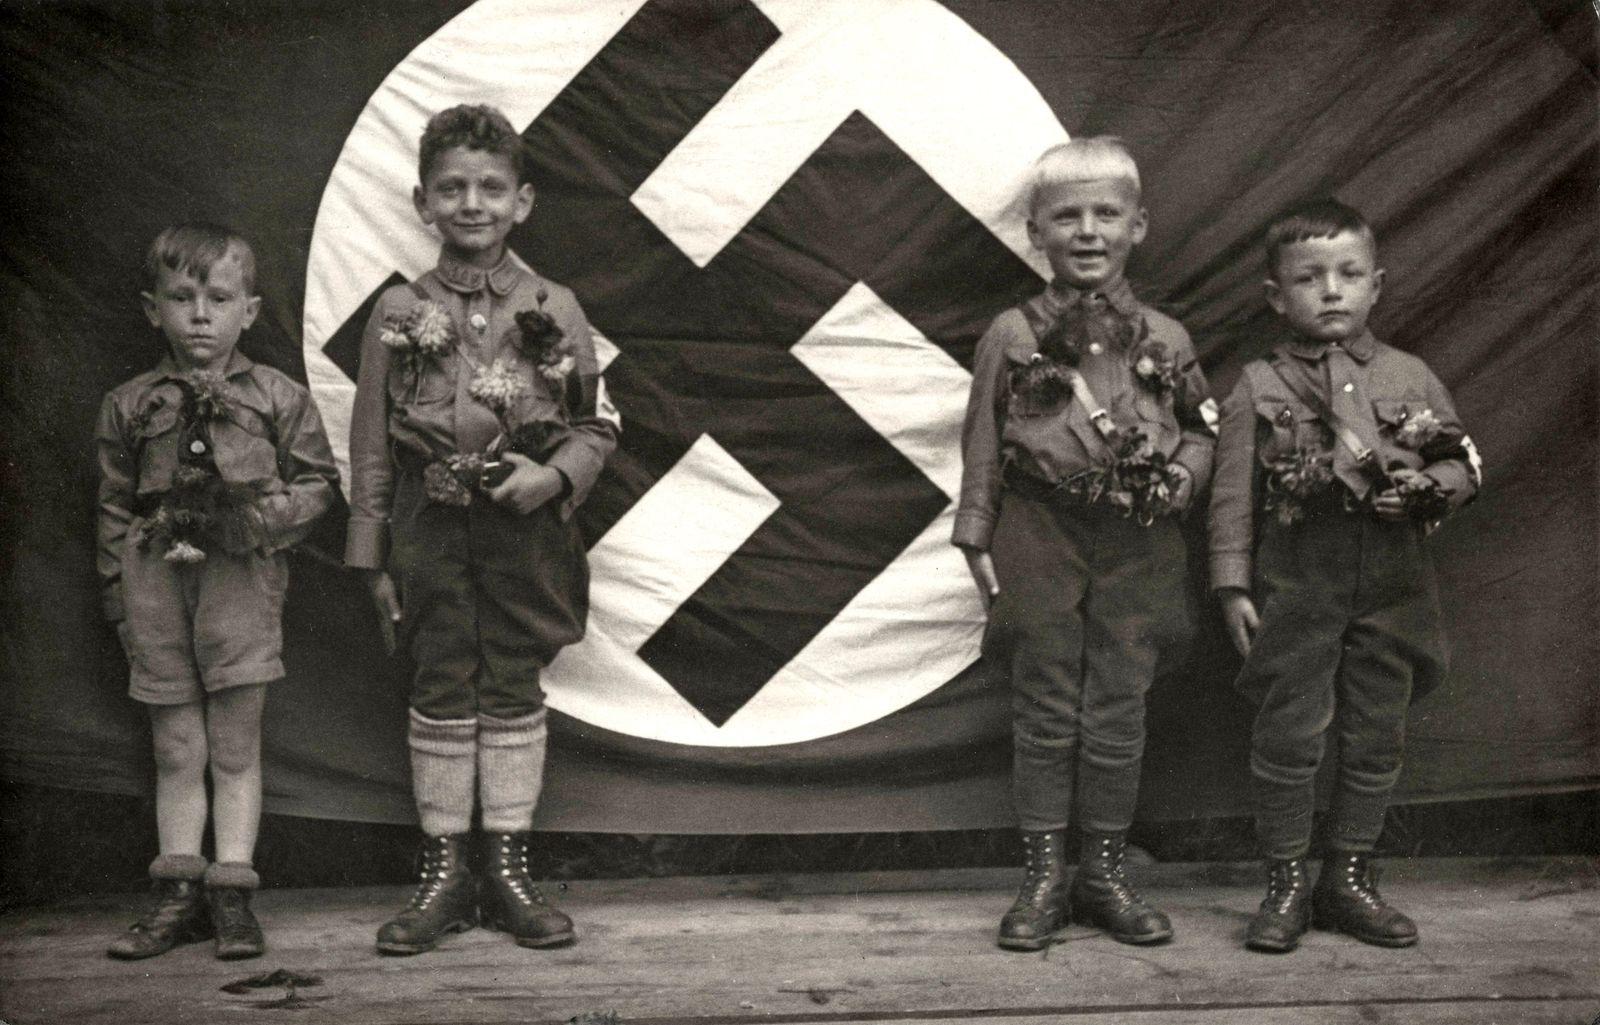 Jan 3 2015 Four Boys Hitler Youth Germany circa 1935 PUBLICATIONxINxGERxSUIxAUTxONLY ZUMAg1